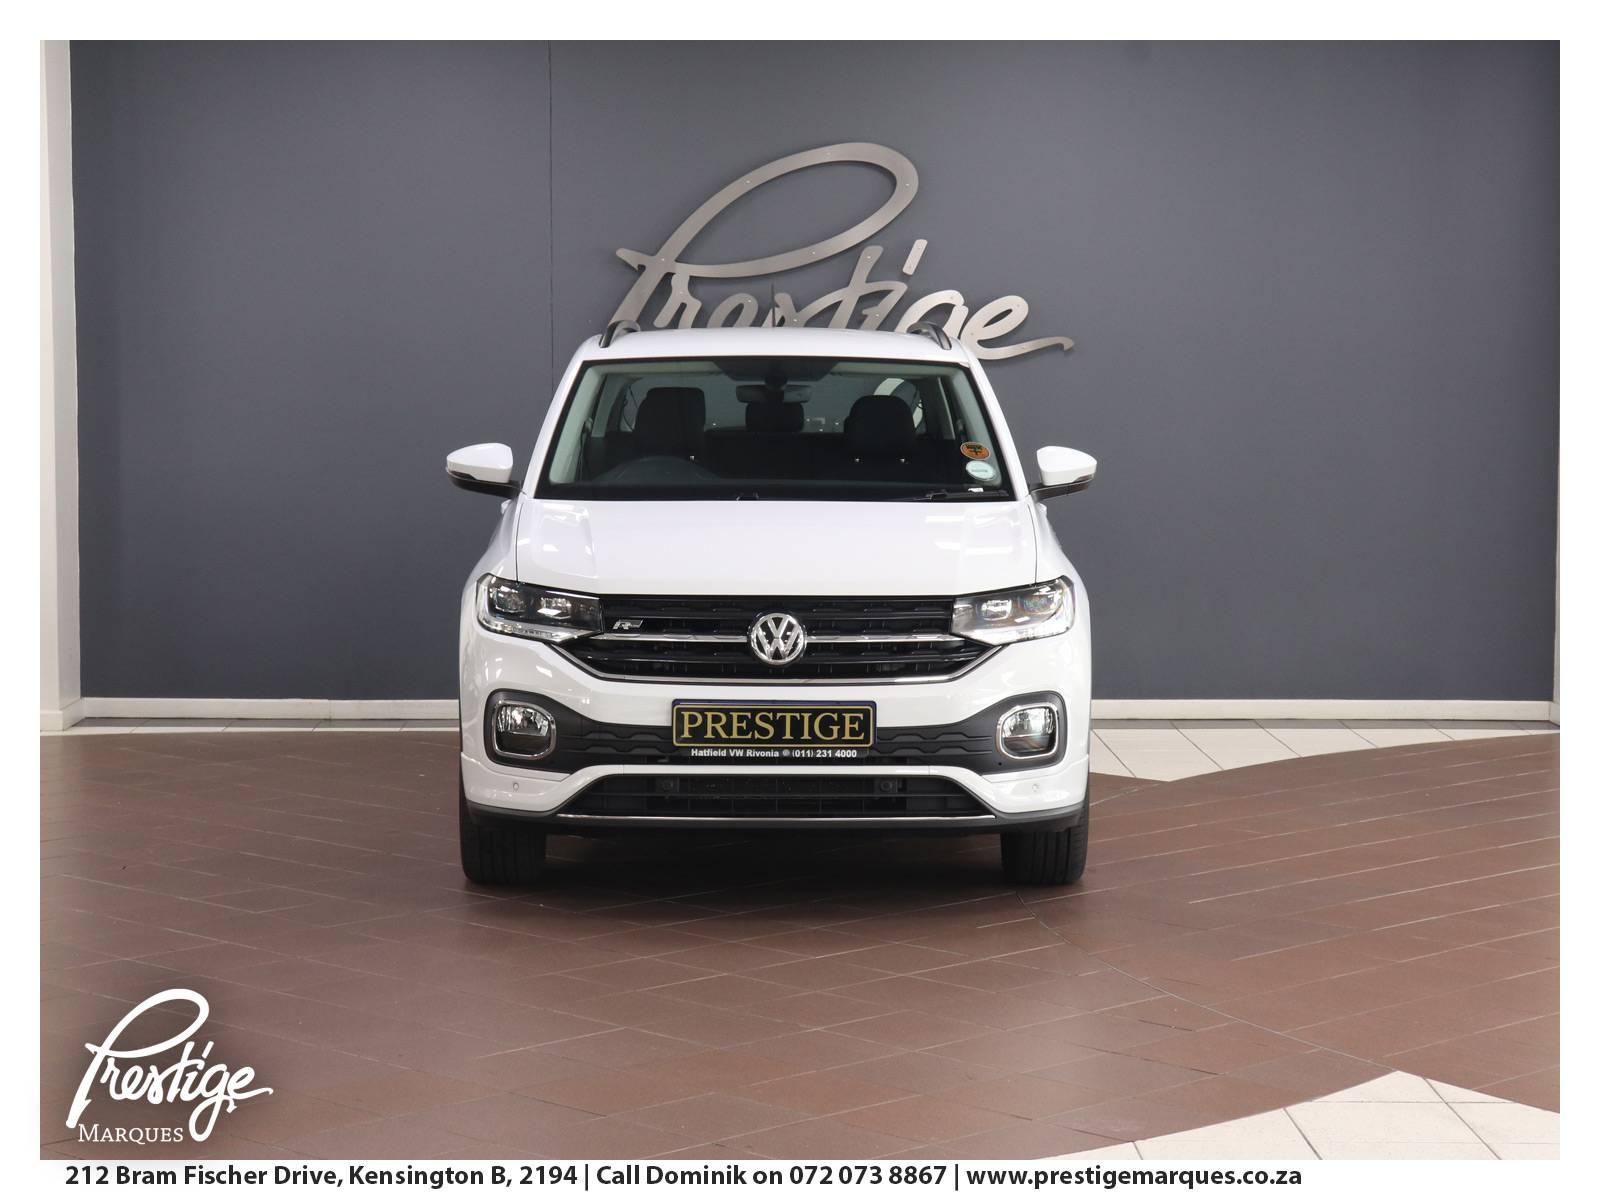 2019-Volkswagen-T-Cross-Prestige-Marques-Randburg-Sandton-8